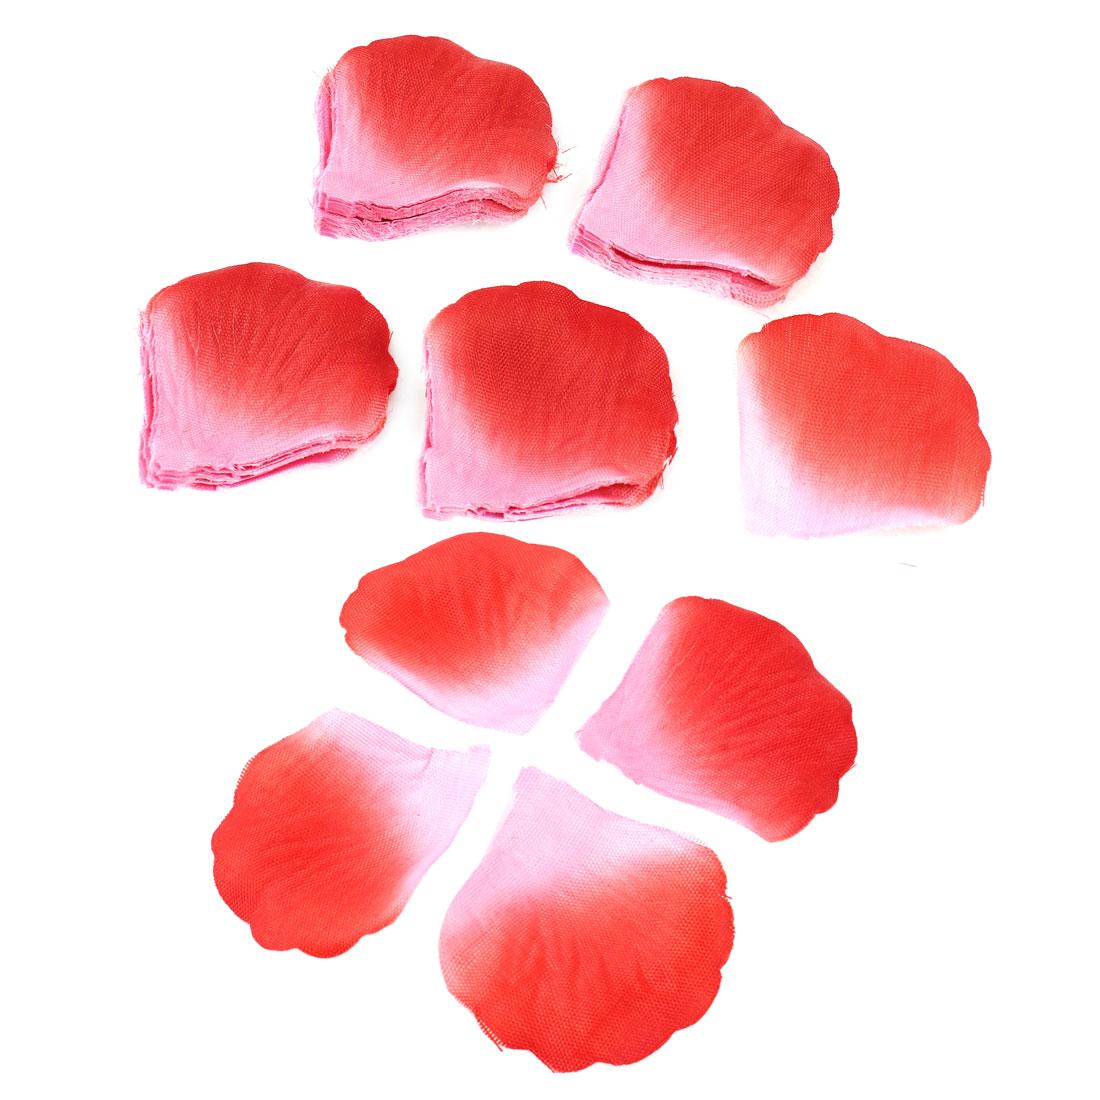 200 Pcs Wedding Bridal Decor Fabric Manmade Rose Petal Red Pink